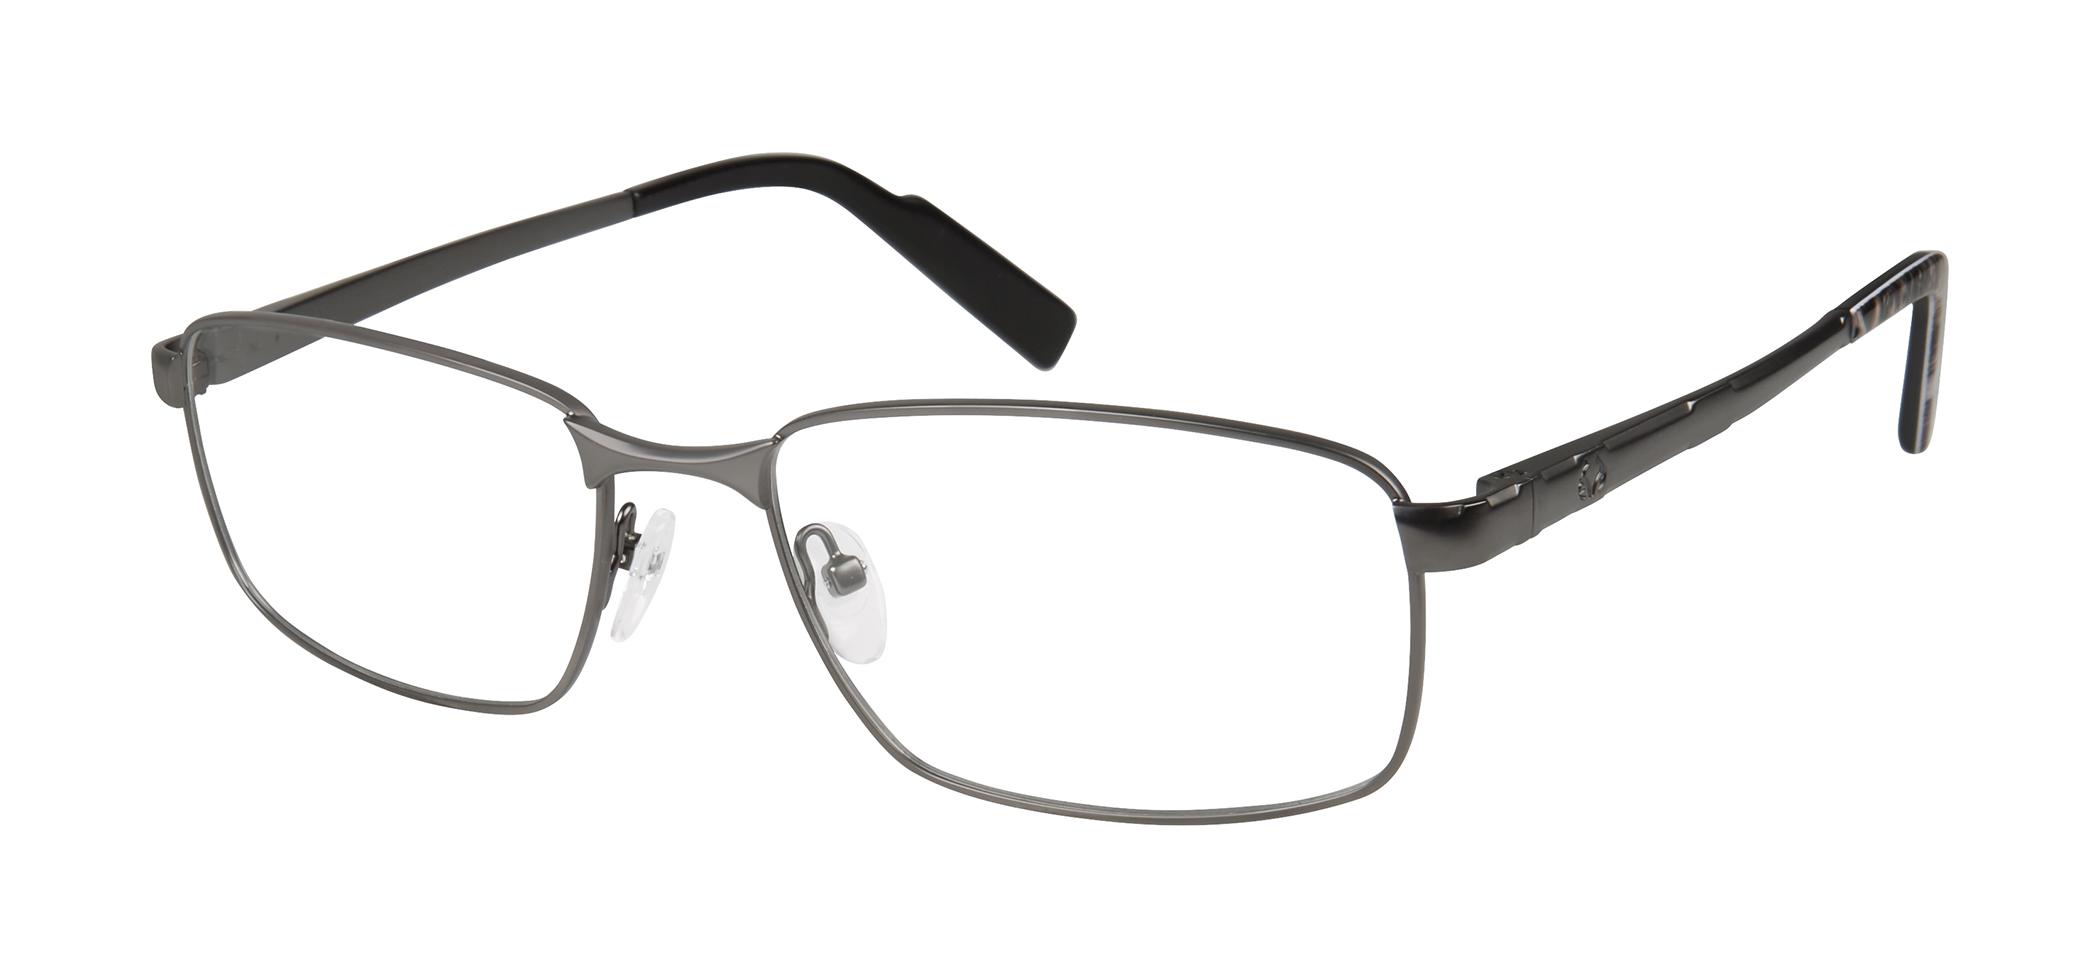 Nouveau Eyewear Introduces New Realtree Eyewear Designs